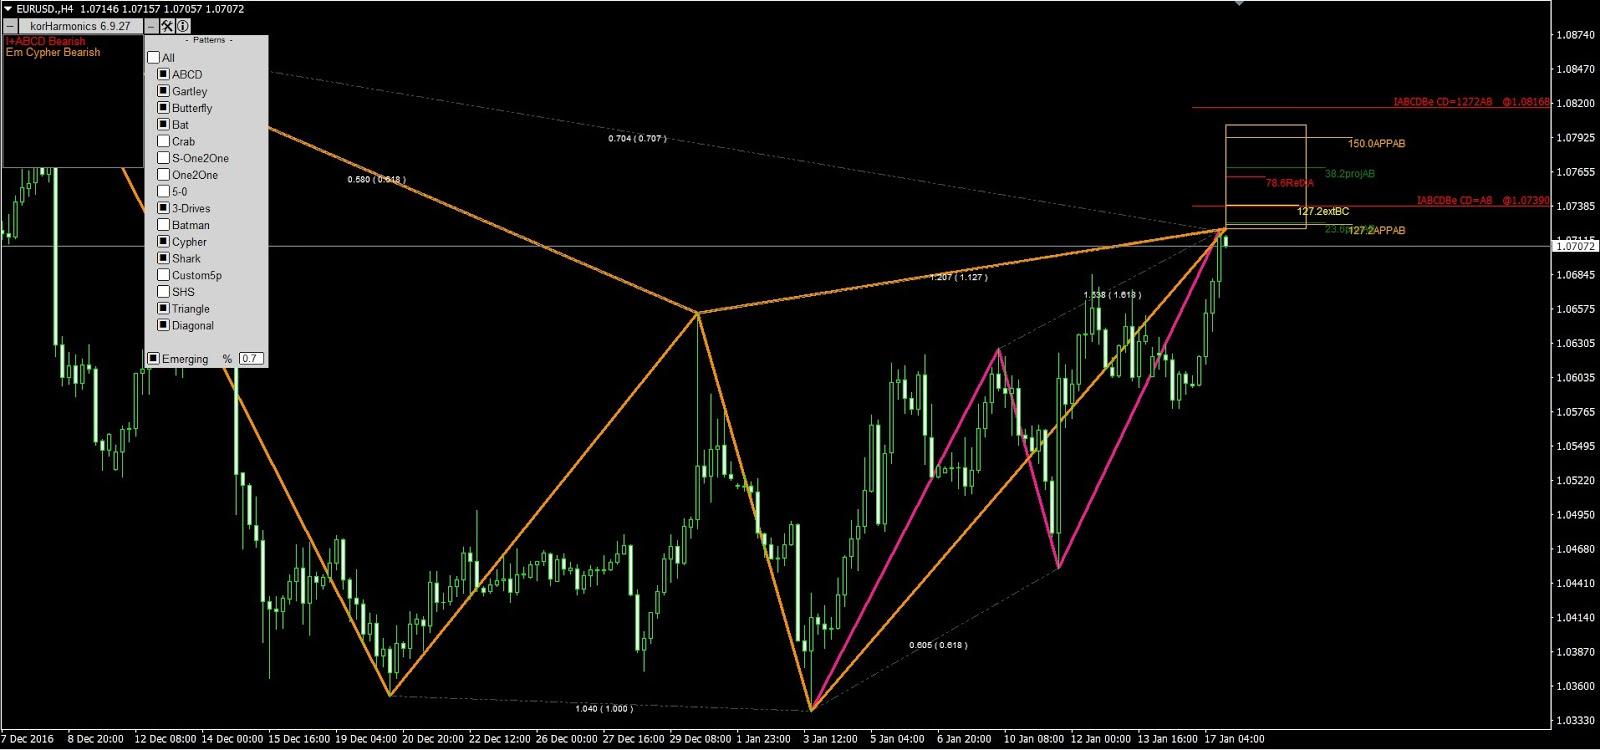 Harmonics Tube: Emerging cypher bearish pattern by